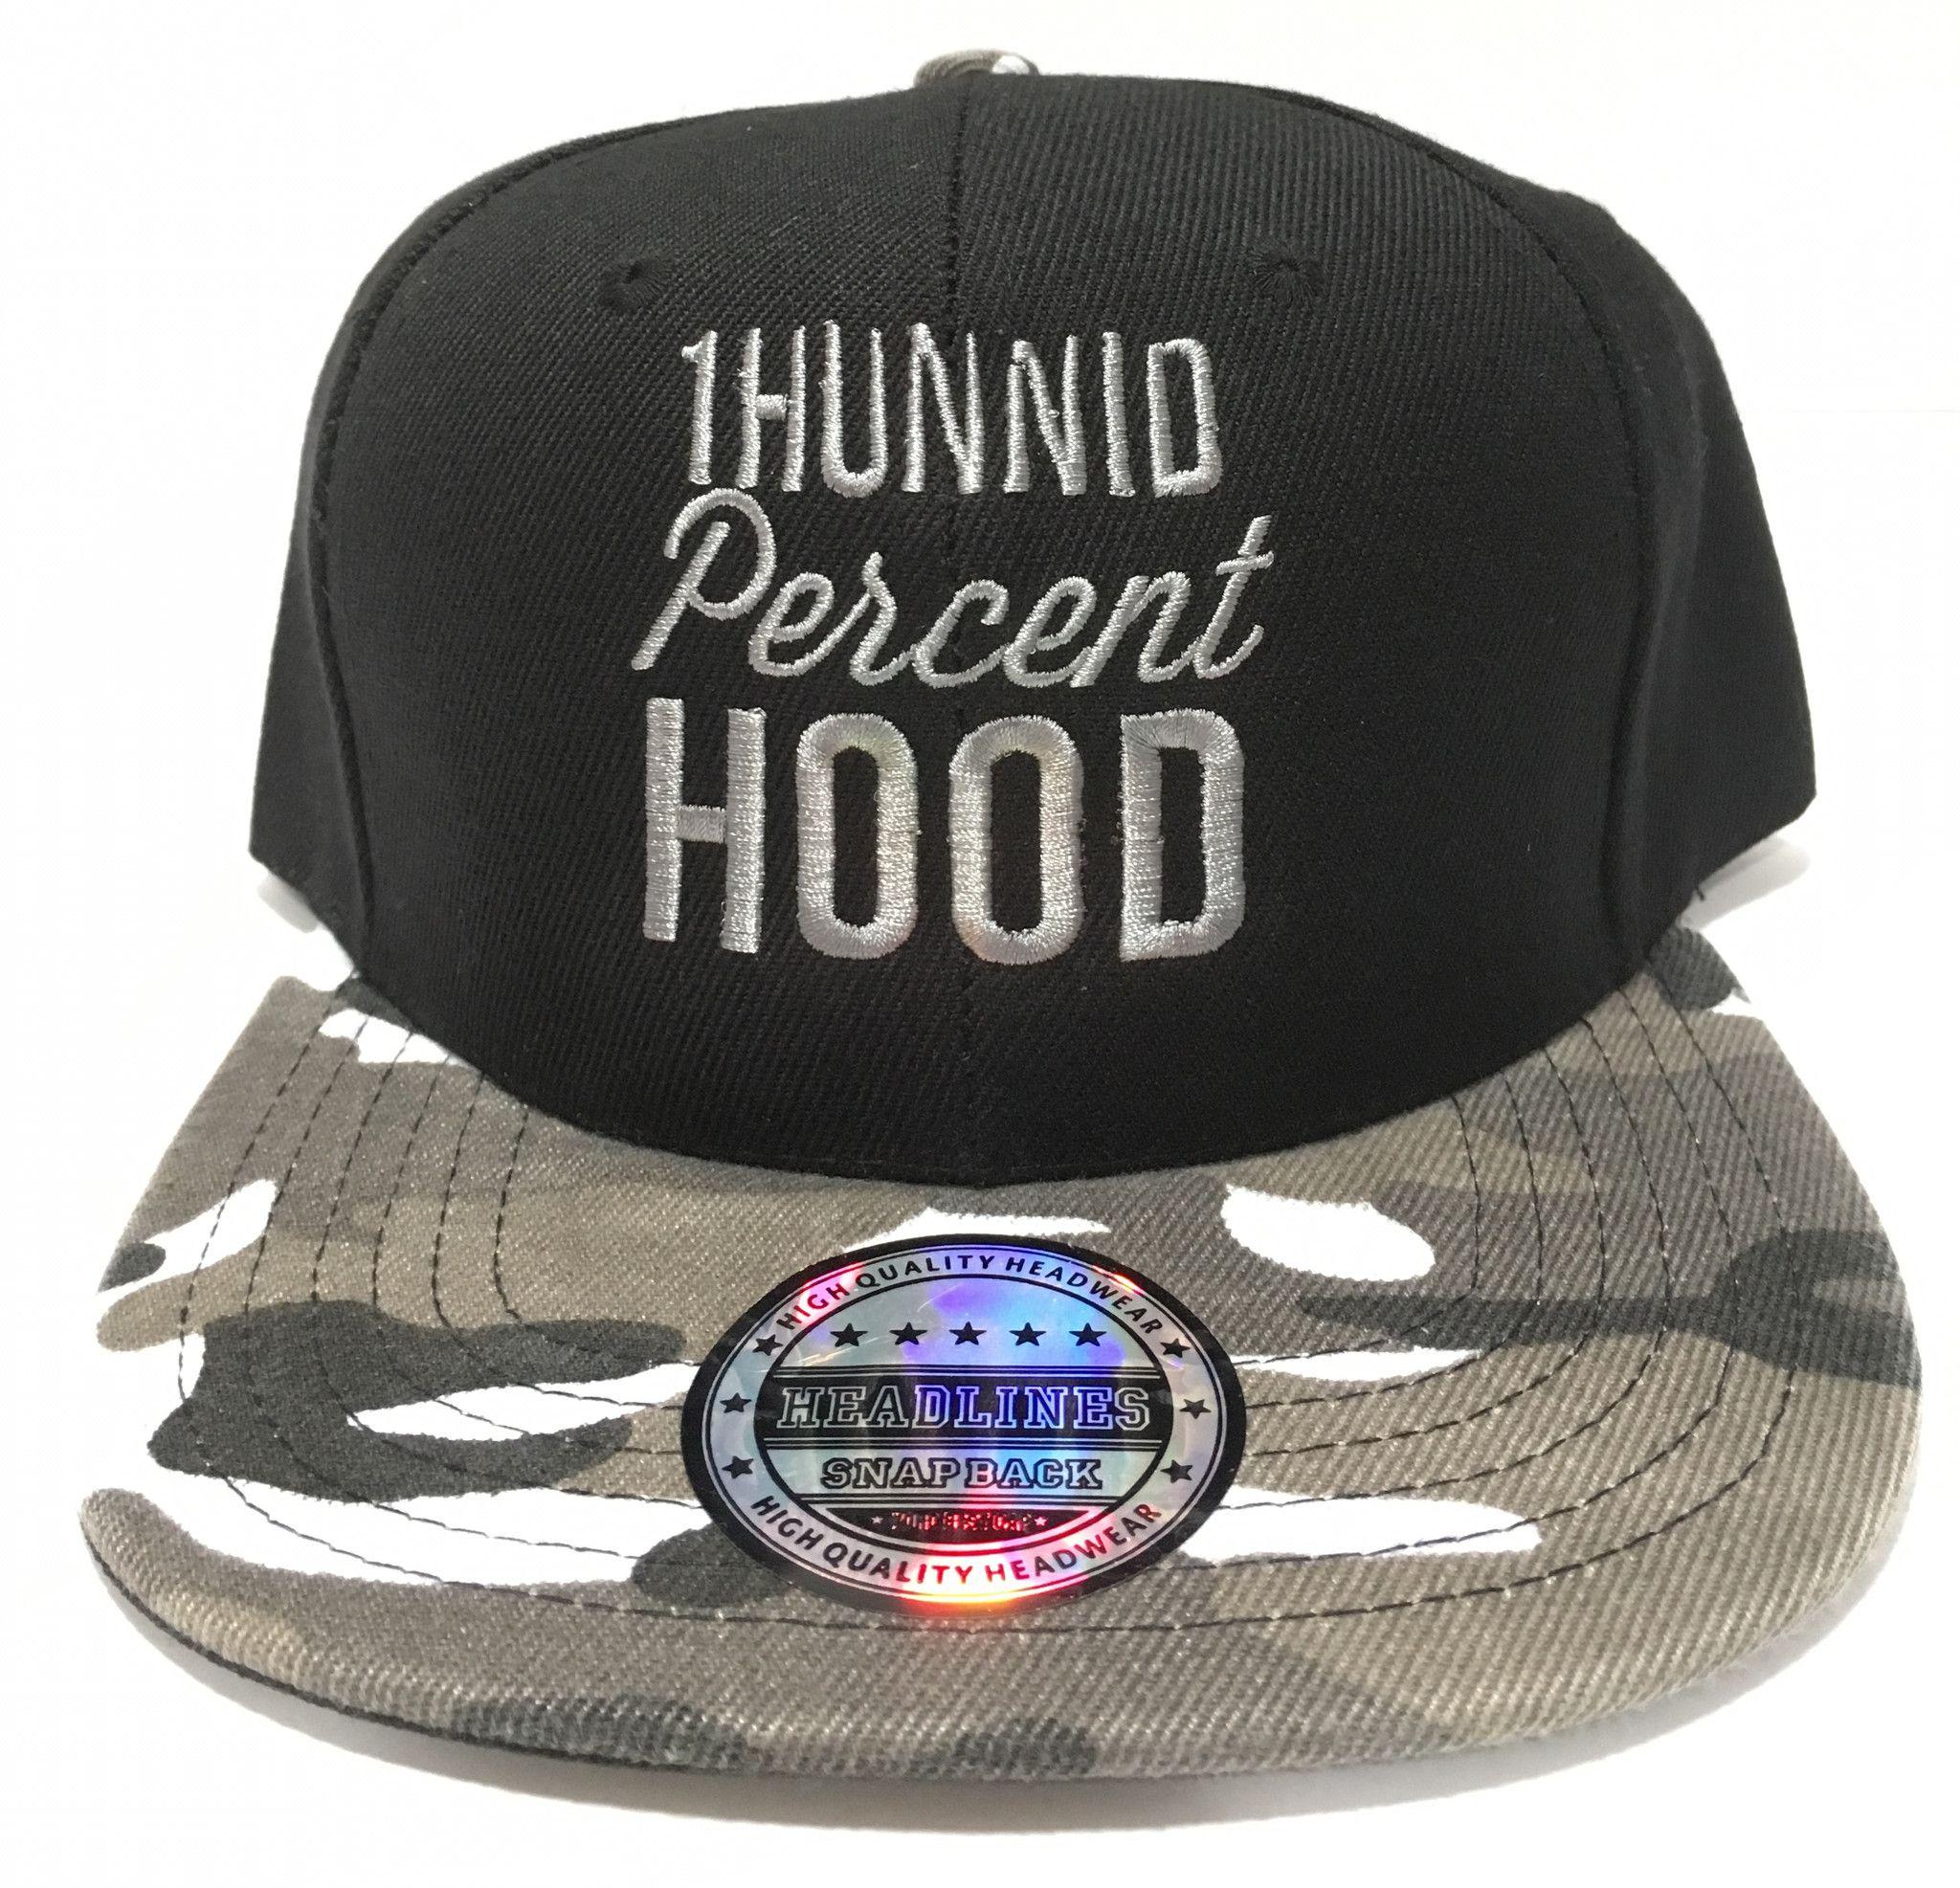 looking for something new? how about Black Camo 1Hunni... get it here http://100percenthood.biz/products/copy-of-blue-bandanna-1hunnid-percent-hood-snapback-baseball-cap?utm_campaign=social_autopilot&utm_source=pin&utm_medium=pin